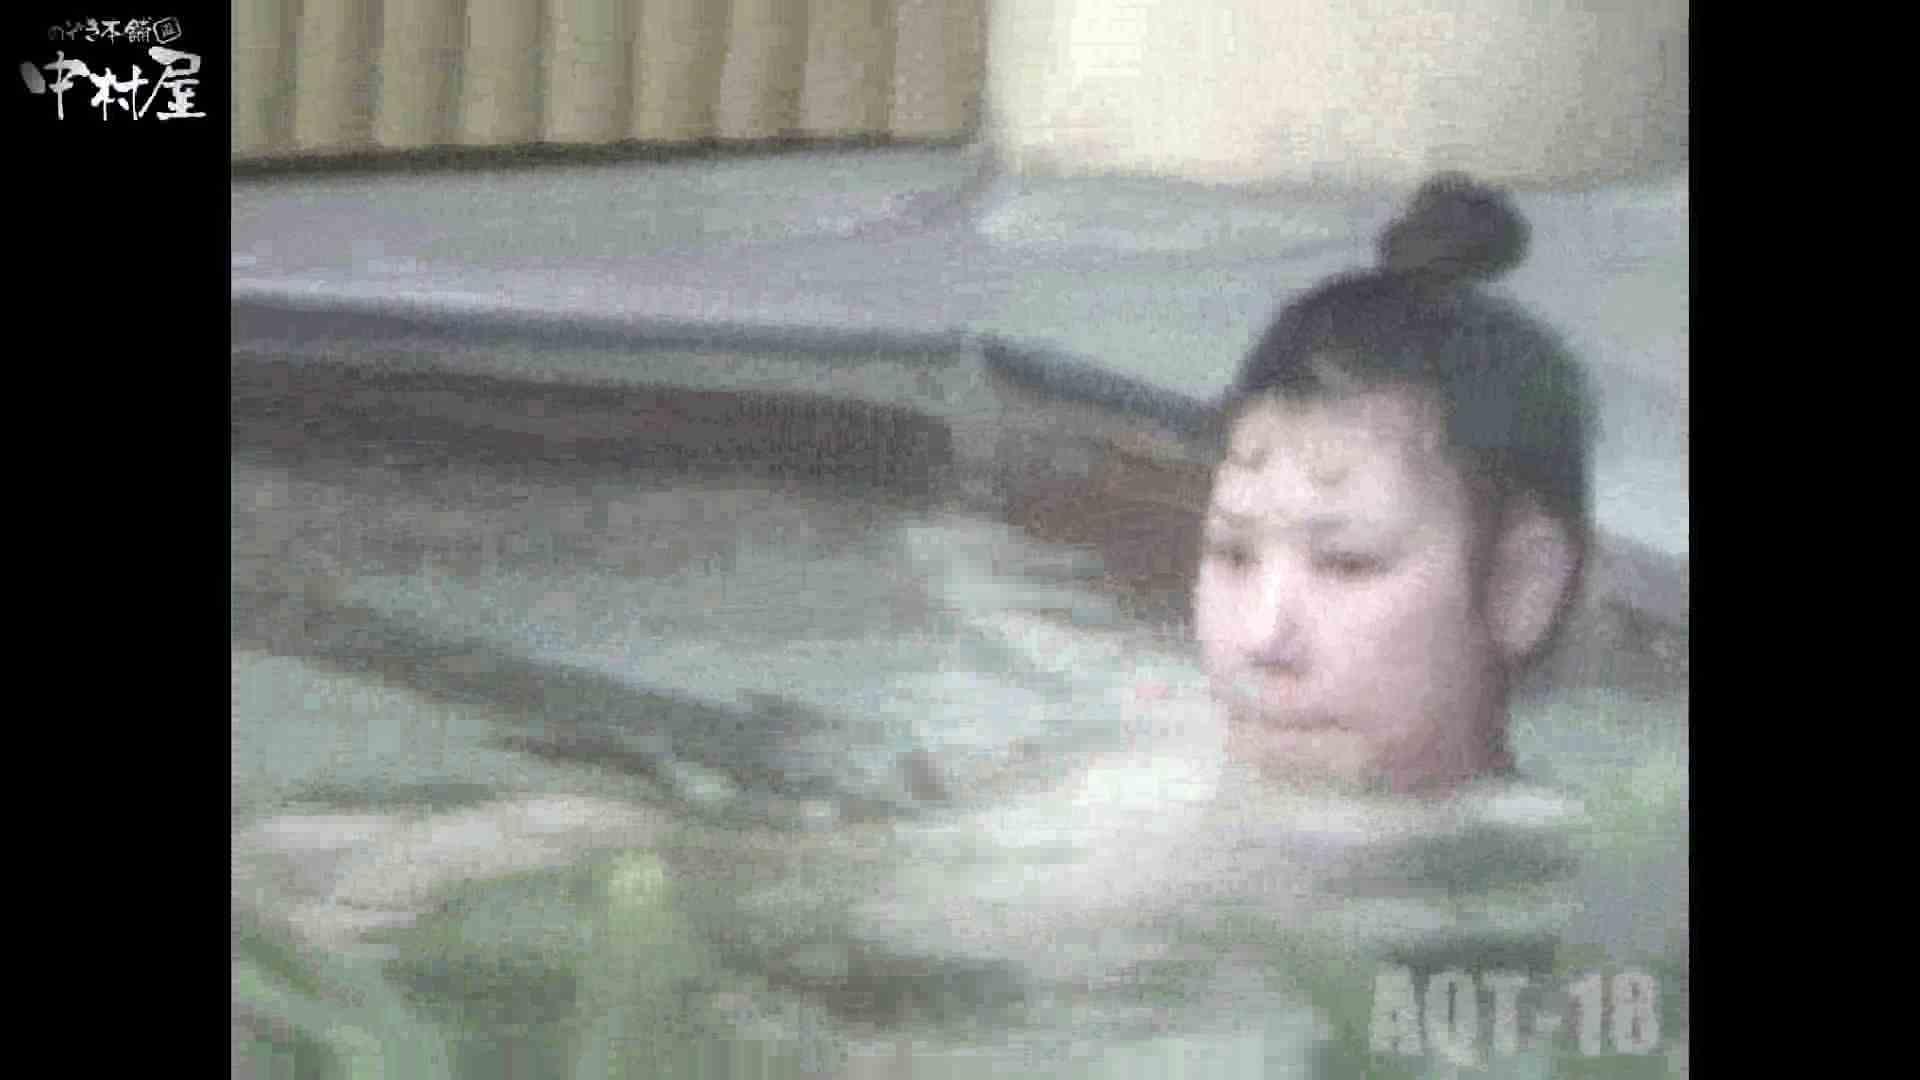 Aquaな露天風呂Vol.882潜入盗撮露天風呂十八判湯 其の二 OLセックス | 露天  90画像 29